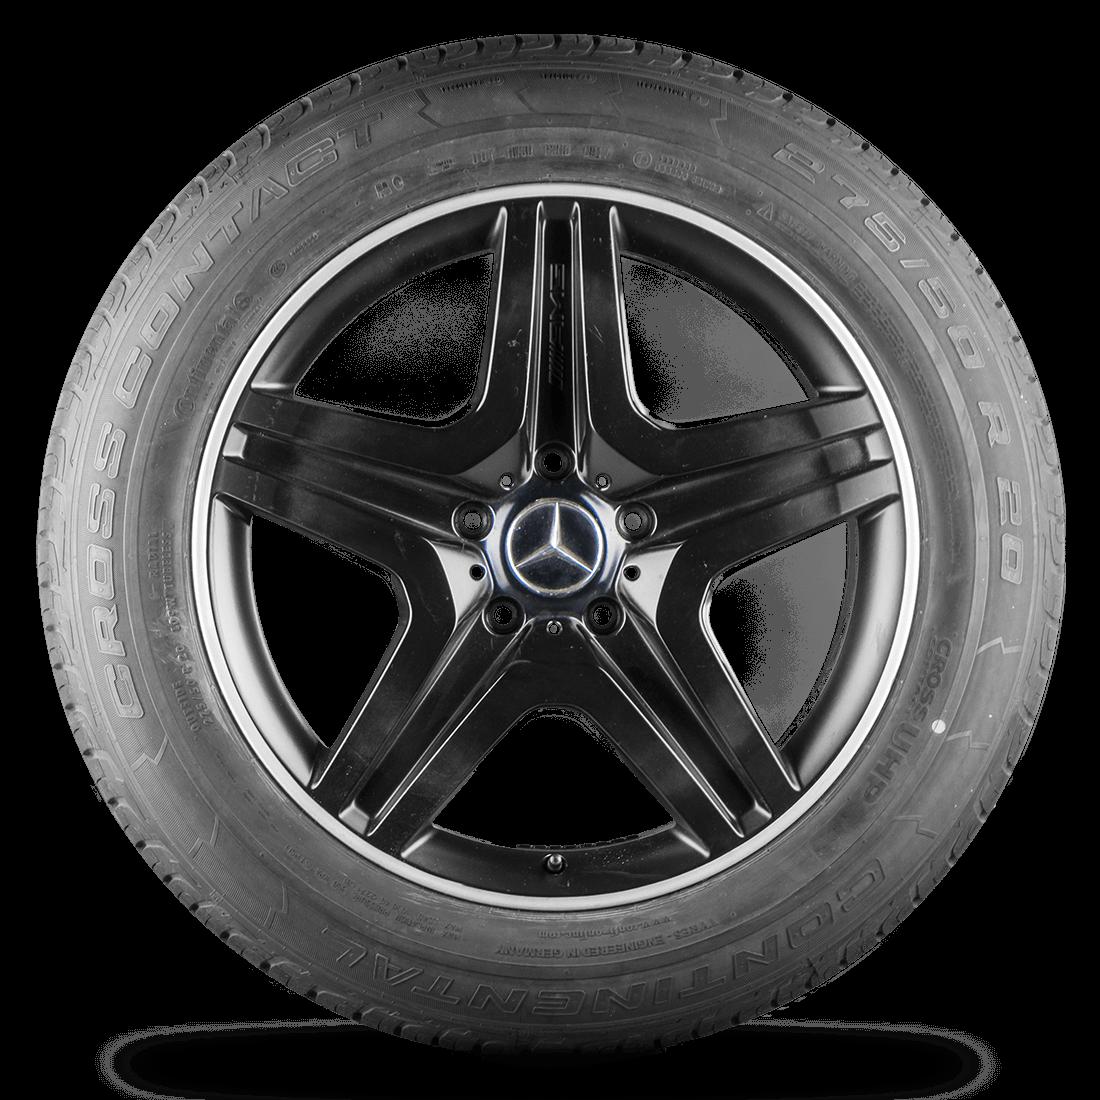 Mercedes Benz G63 G65 AMG G-Klasse W463 20 Zoll Felgen Alufelgen Sommerreifen